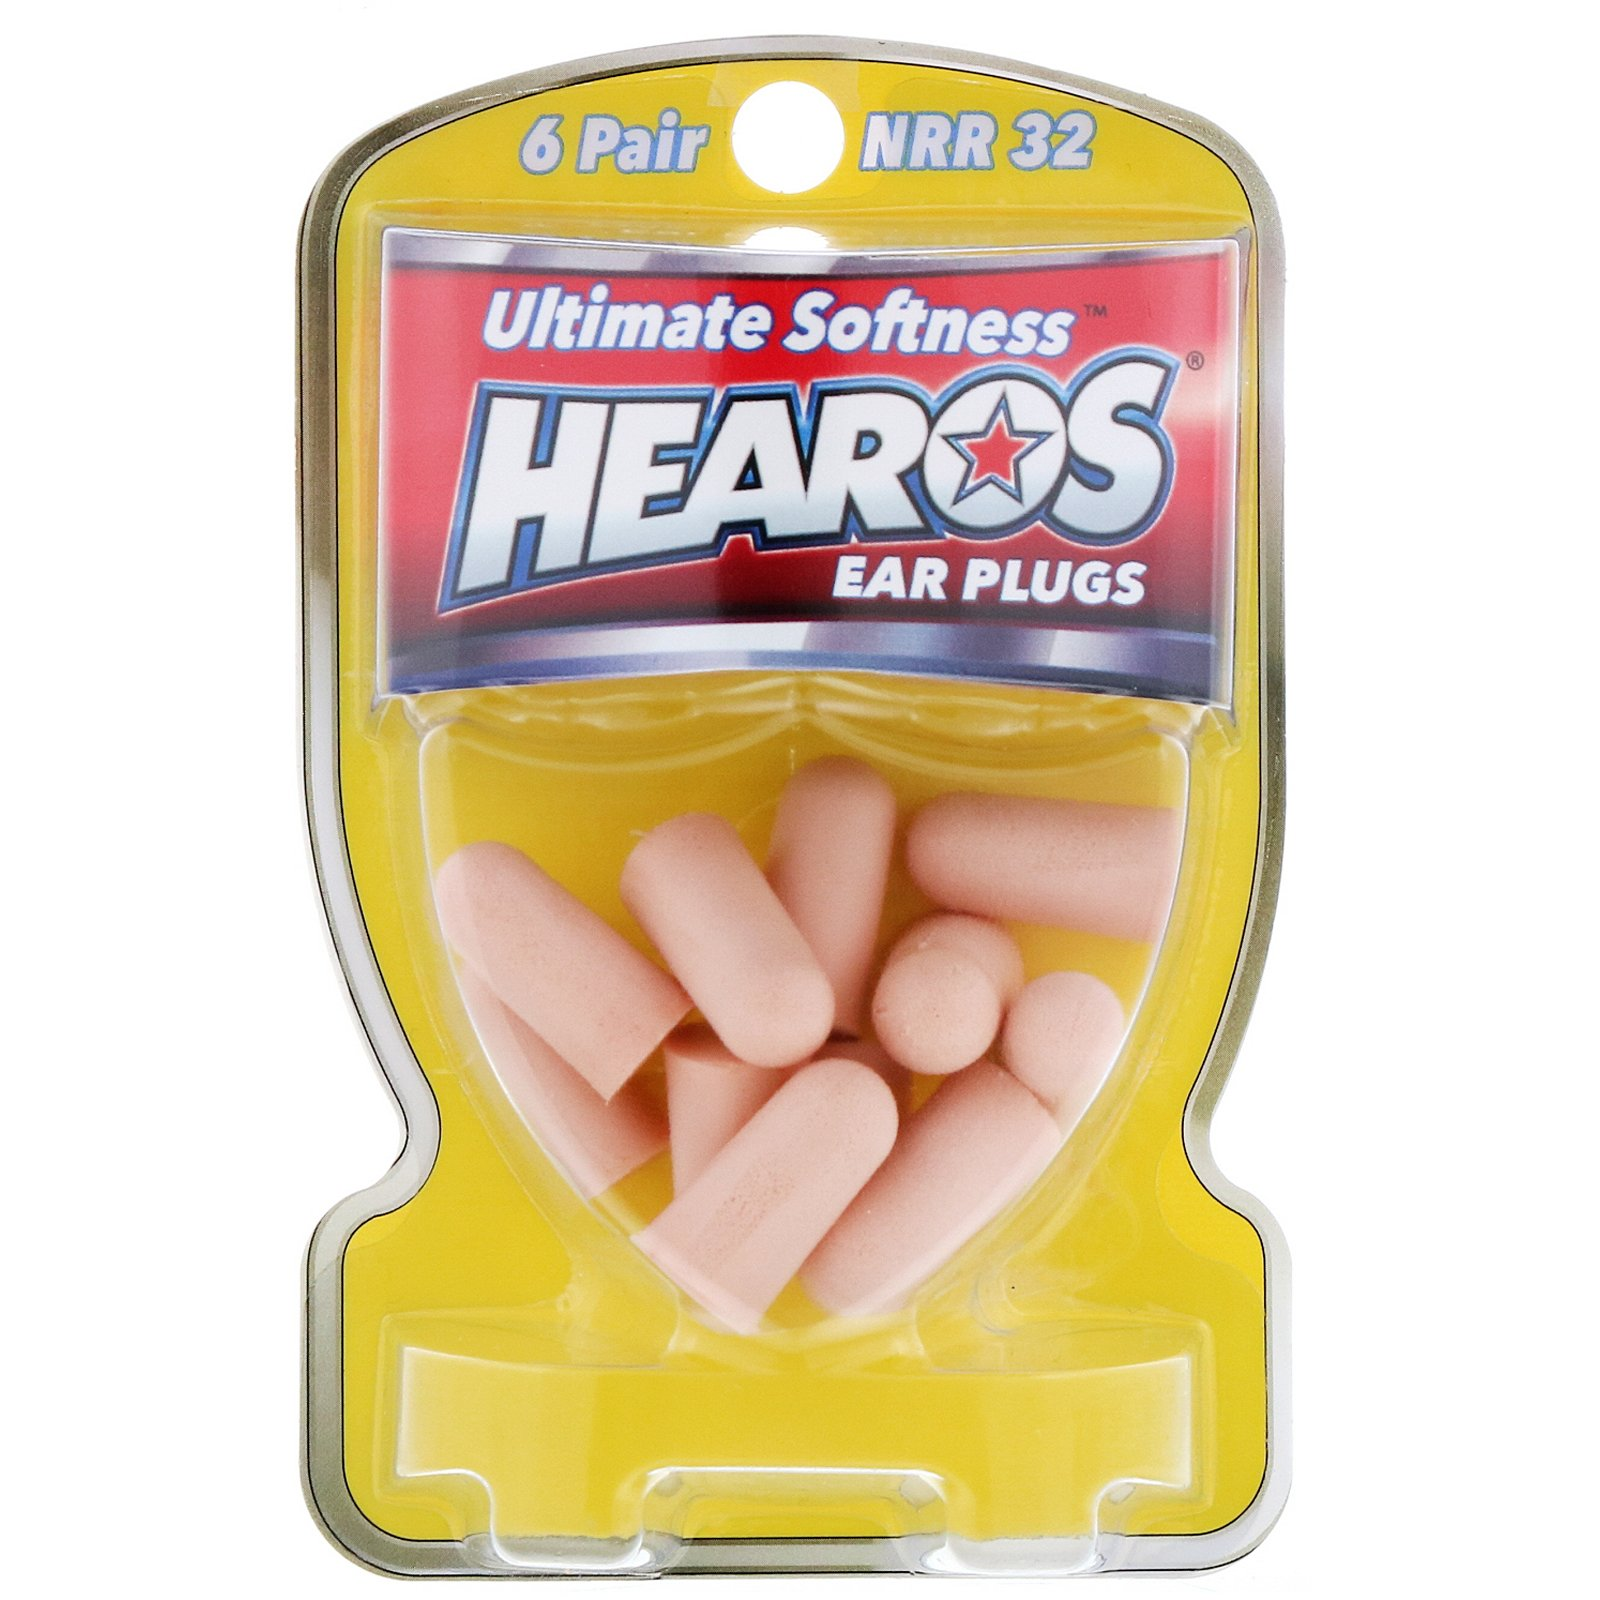 Hearos NRR32  Ultimate Softness Ear Plugs   6 Pair